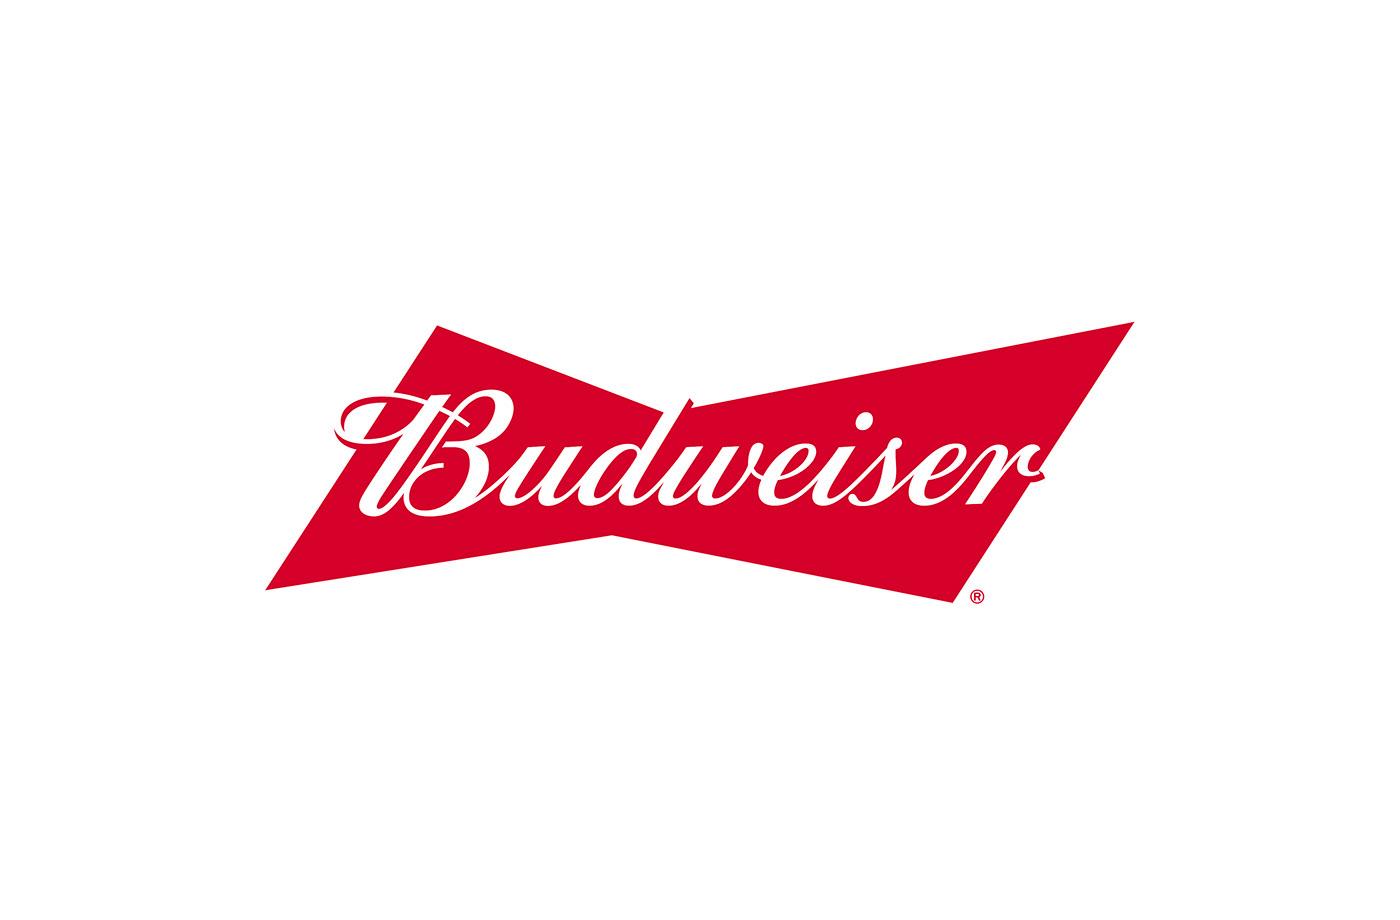 Packaging beer cerveza Budweiser laliga bottle Pack caja merchandising botellin